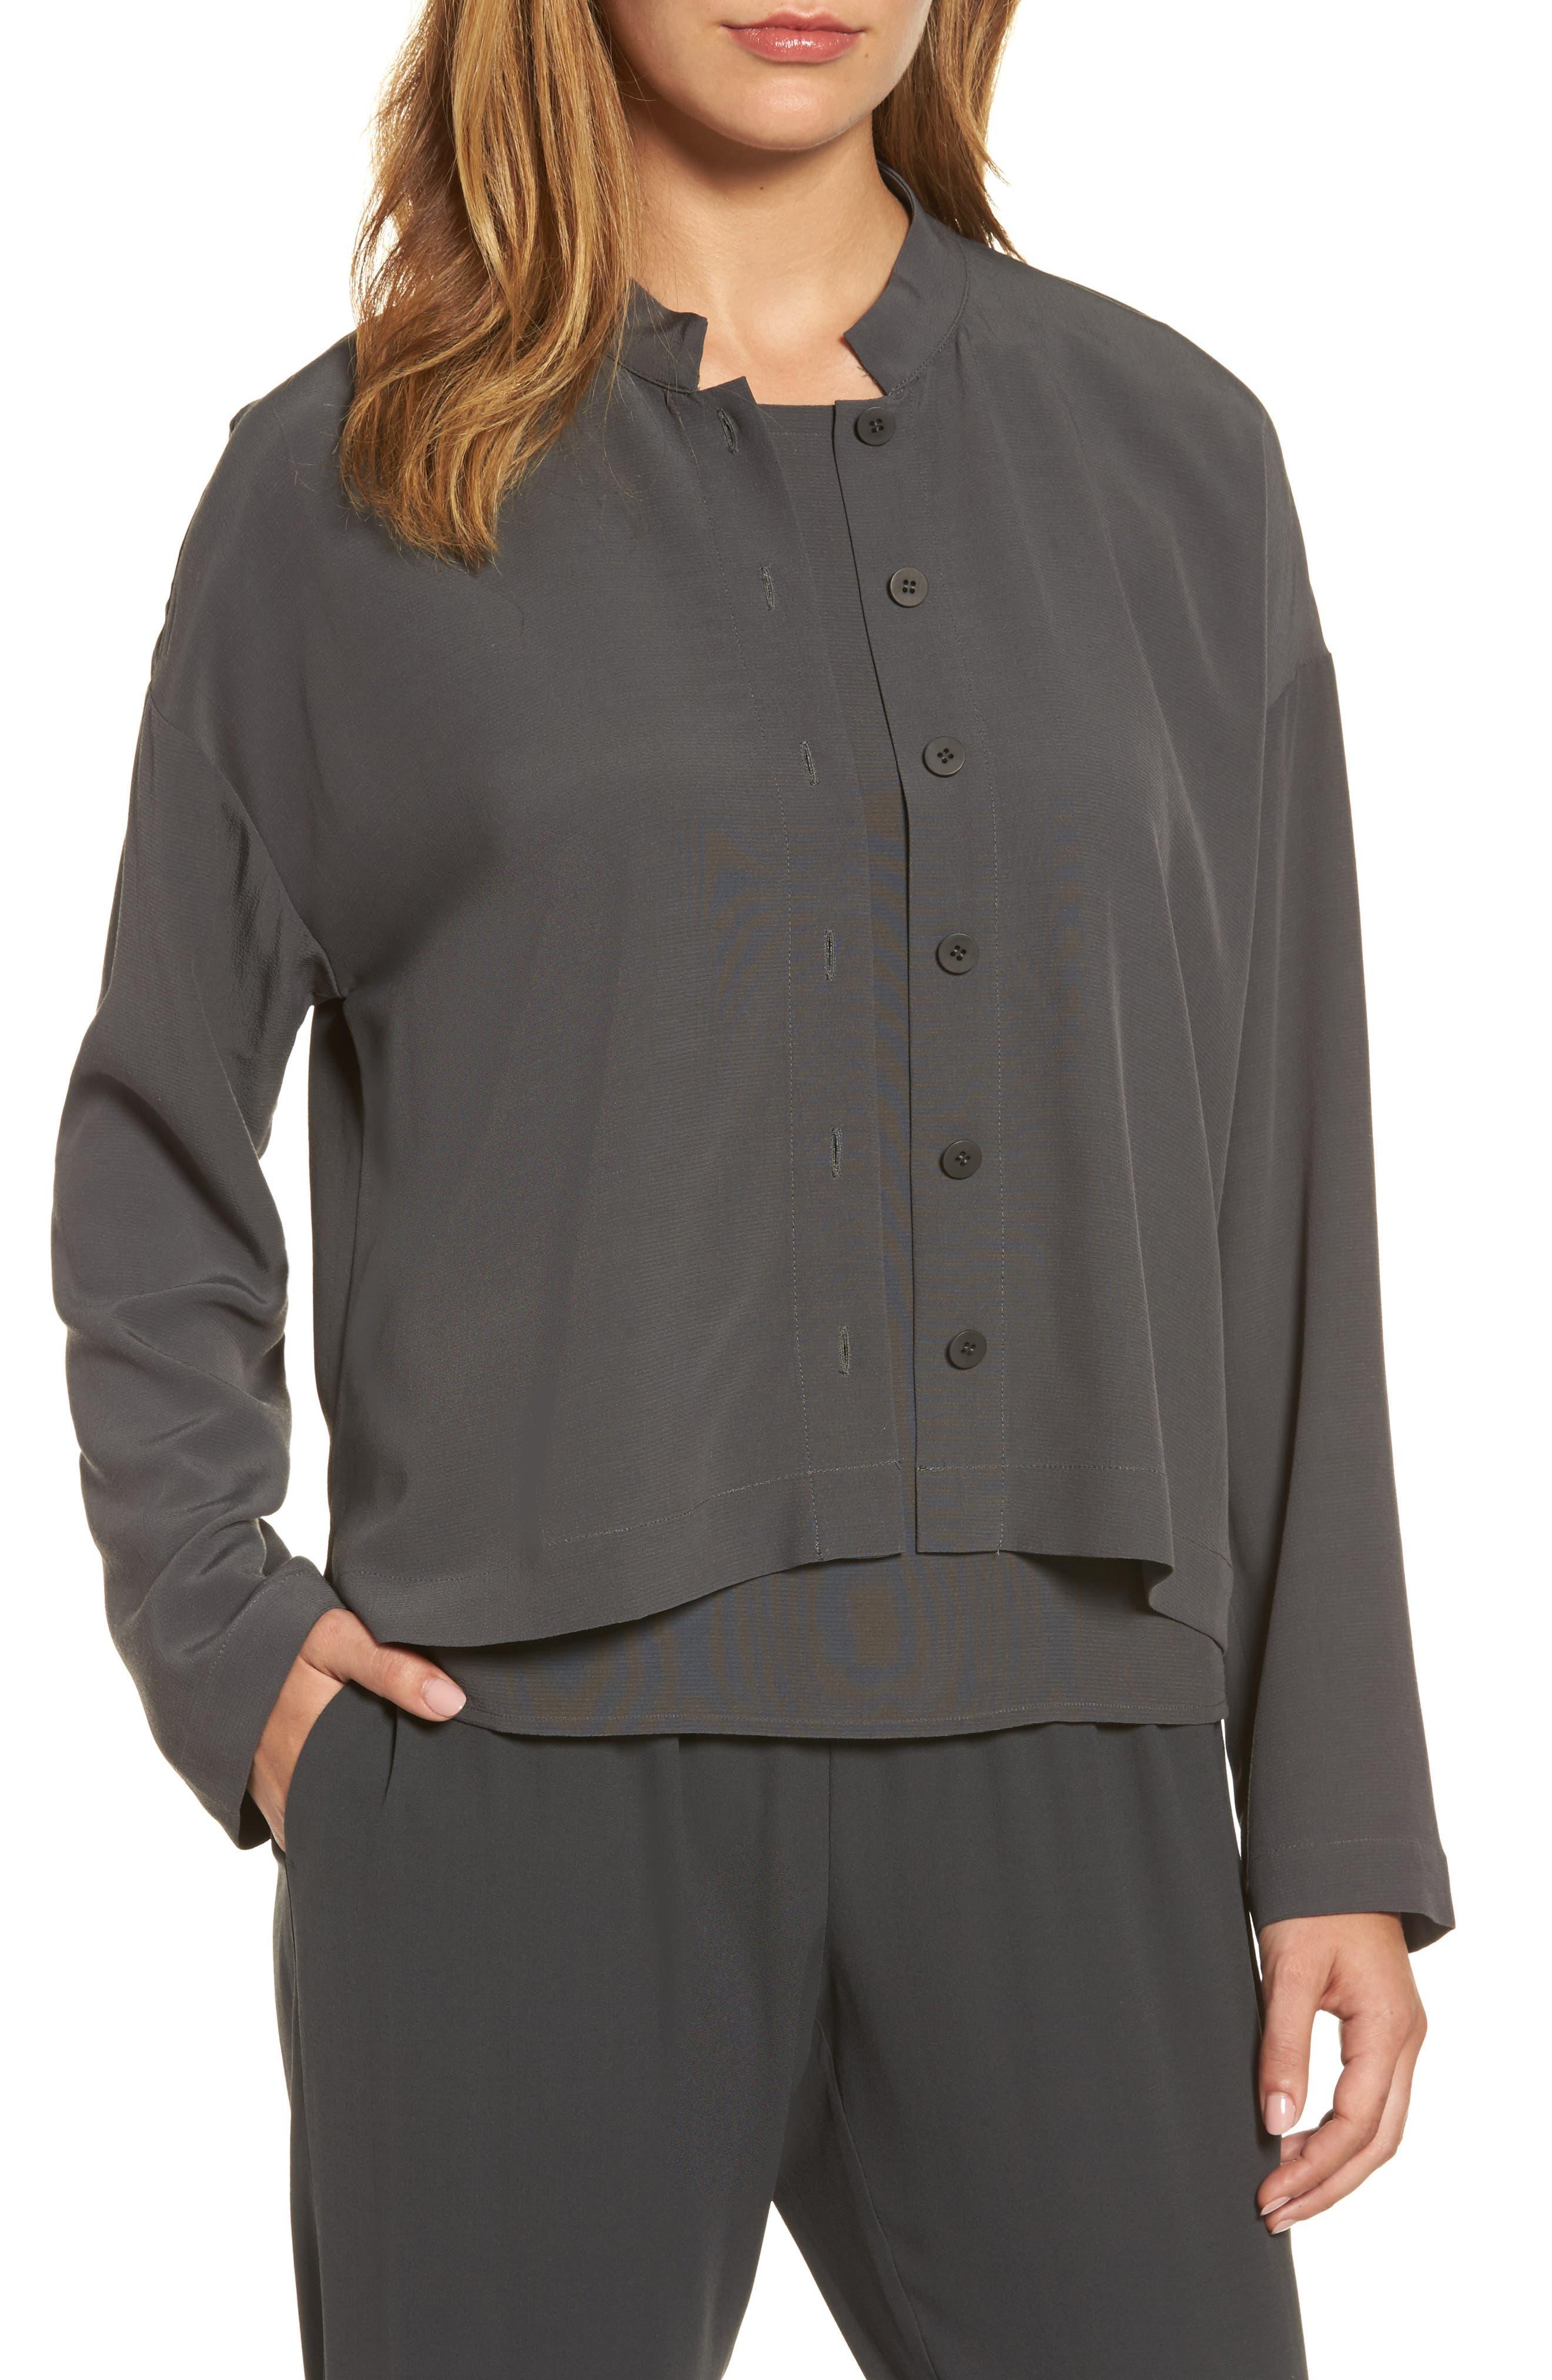 Eileen Fisher Mandarin Collar Boxy Top (Regular & Petite)